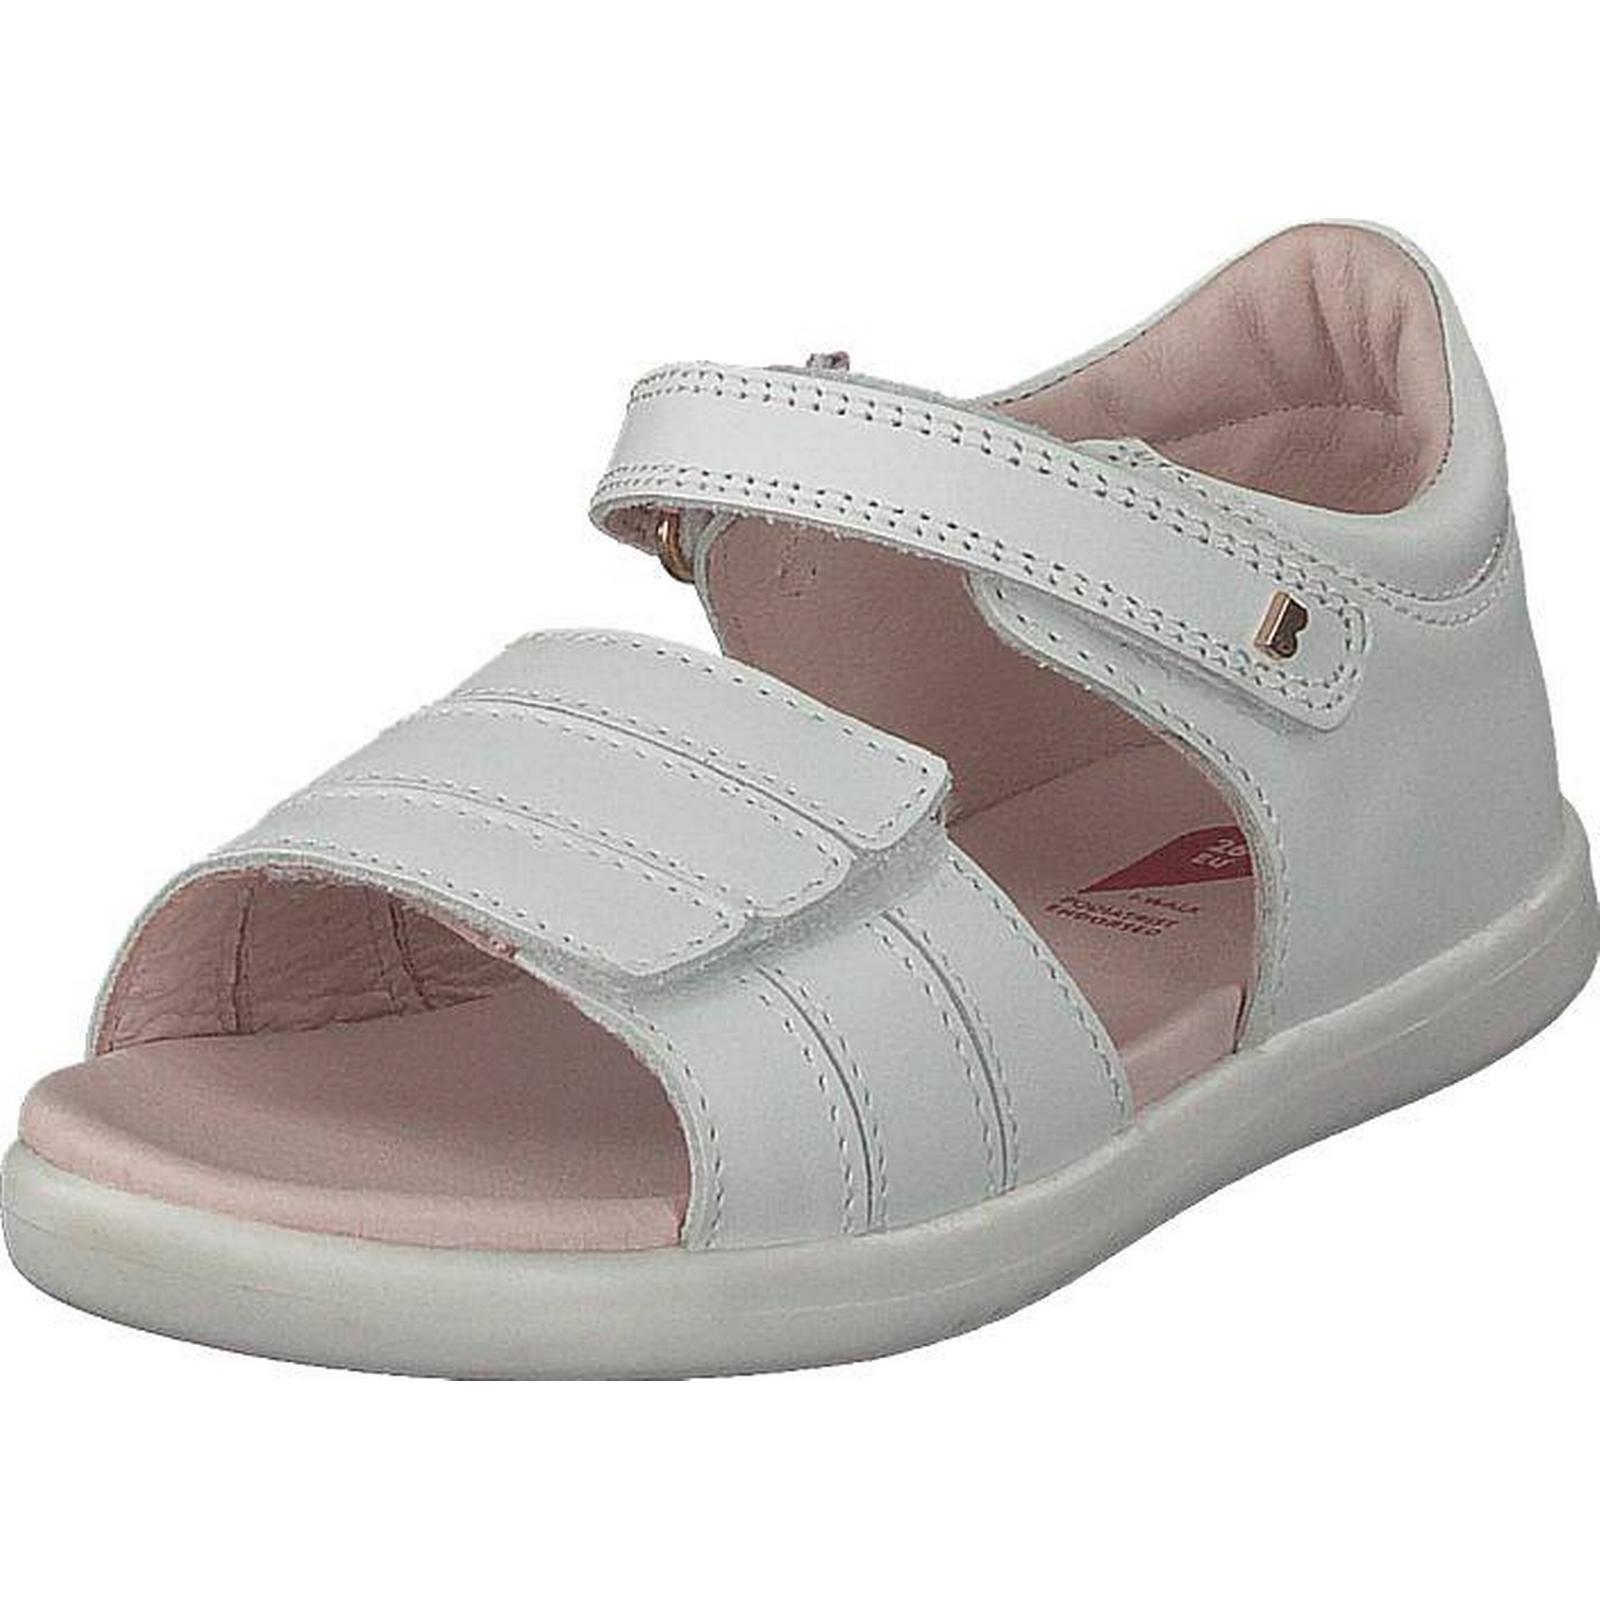 Bobux Hampton Hampton Bobux White, Shoes, Sandals & Slippers, Strappy Sandals, , Unisex, 24 ef8ce5